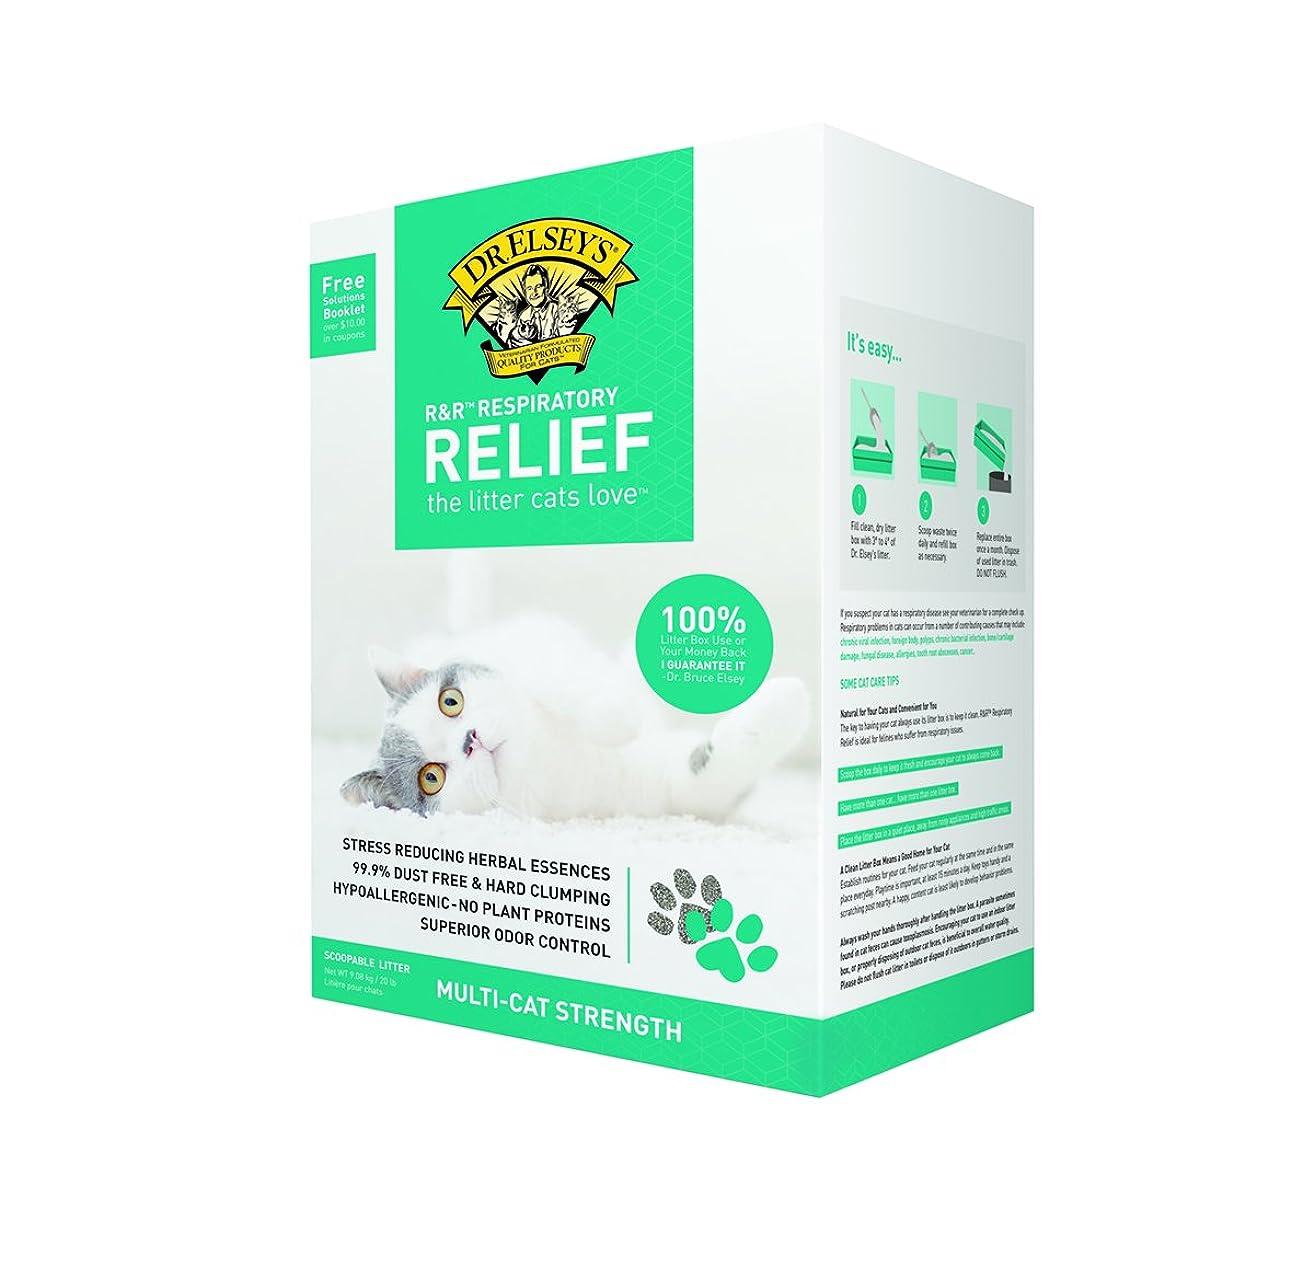 Precious Cat Respiratory Relief Cat Litter with Herbal Essences, 20 lb